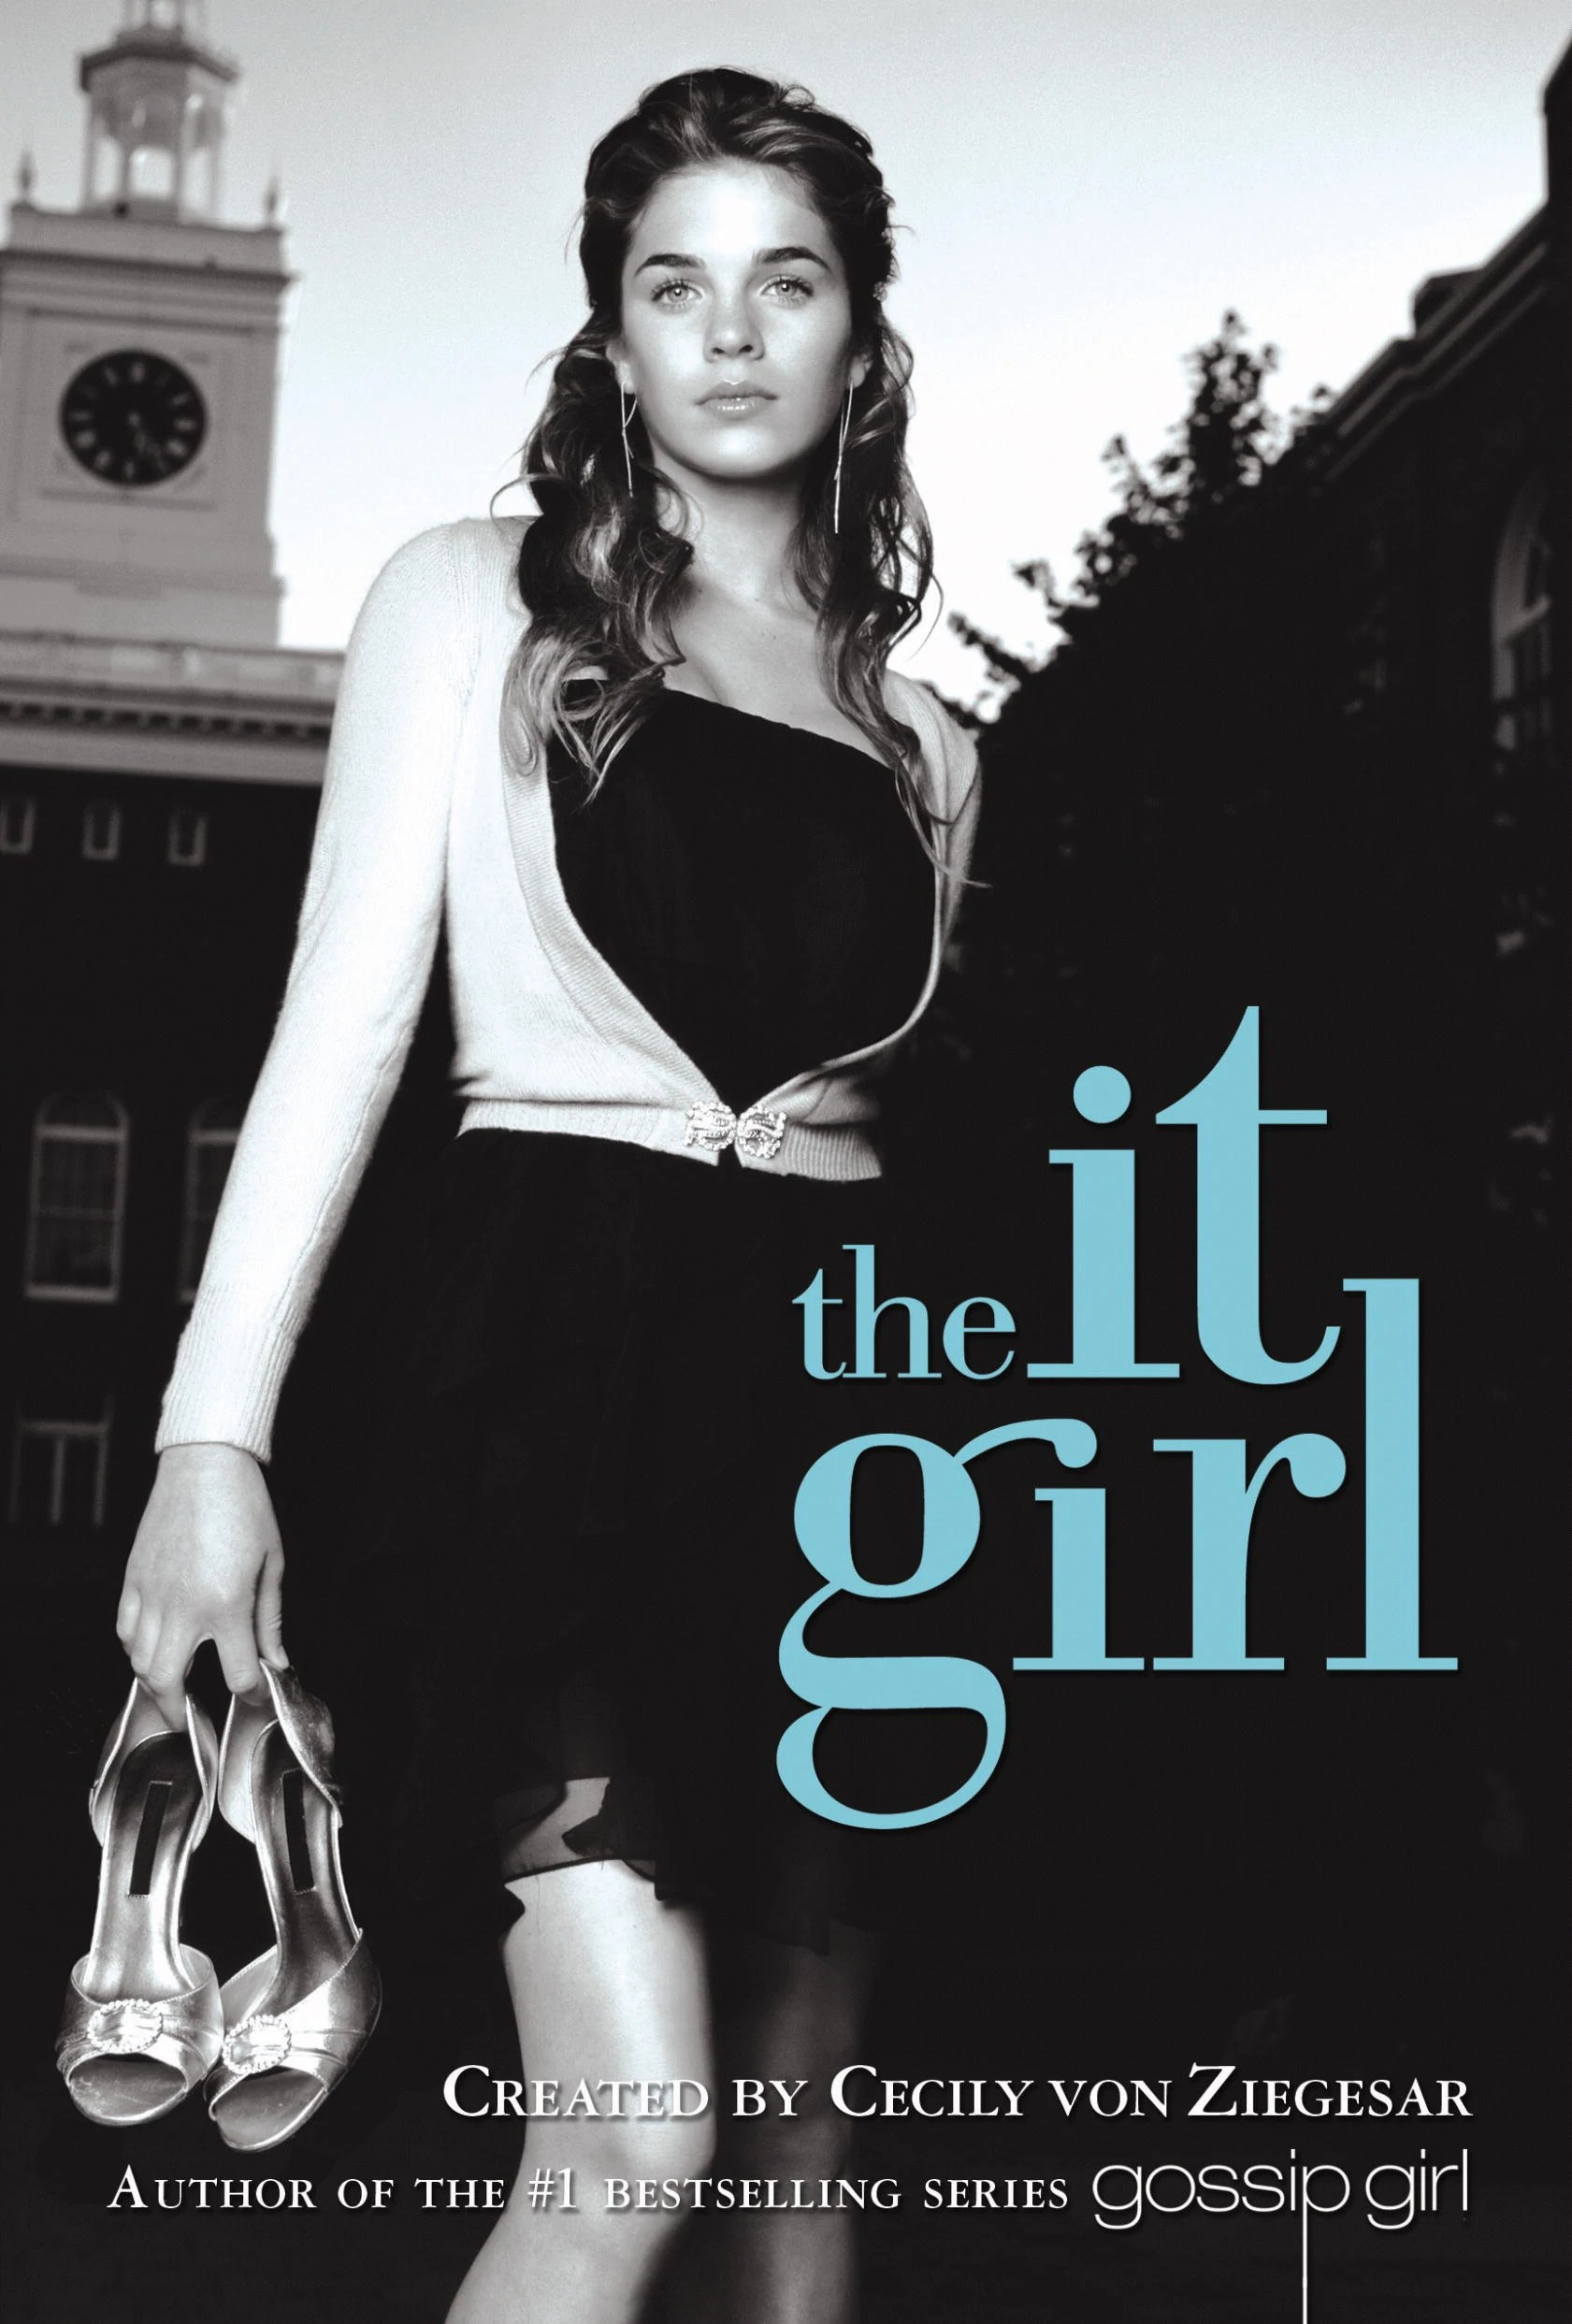 gossip girl books wikia